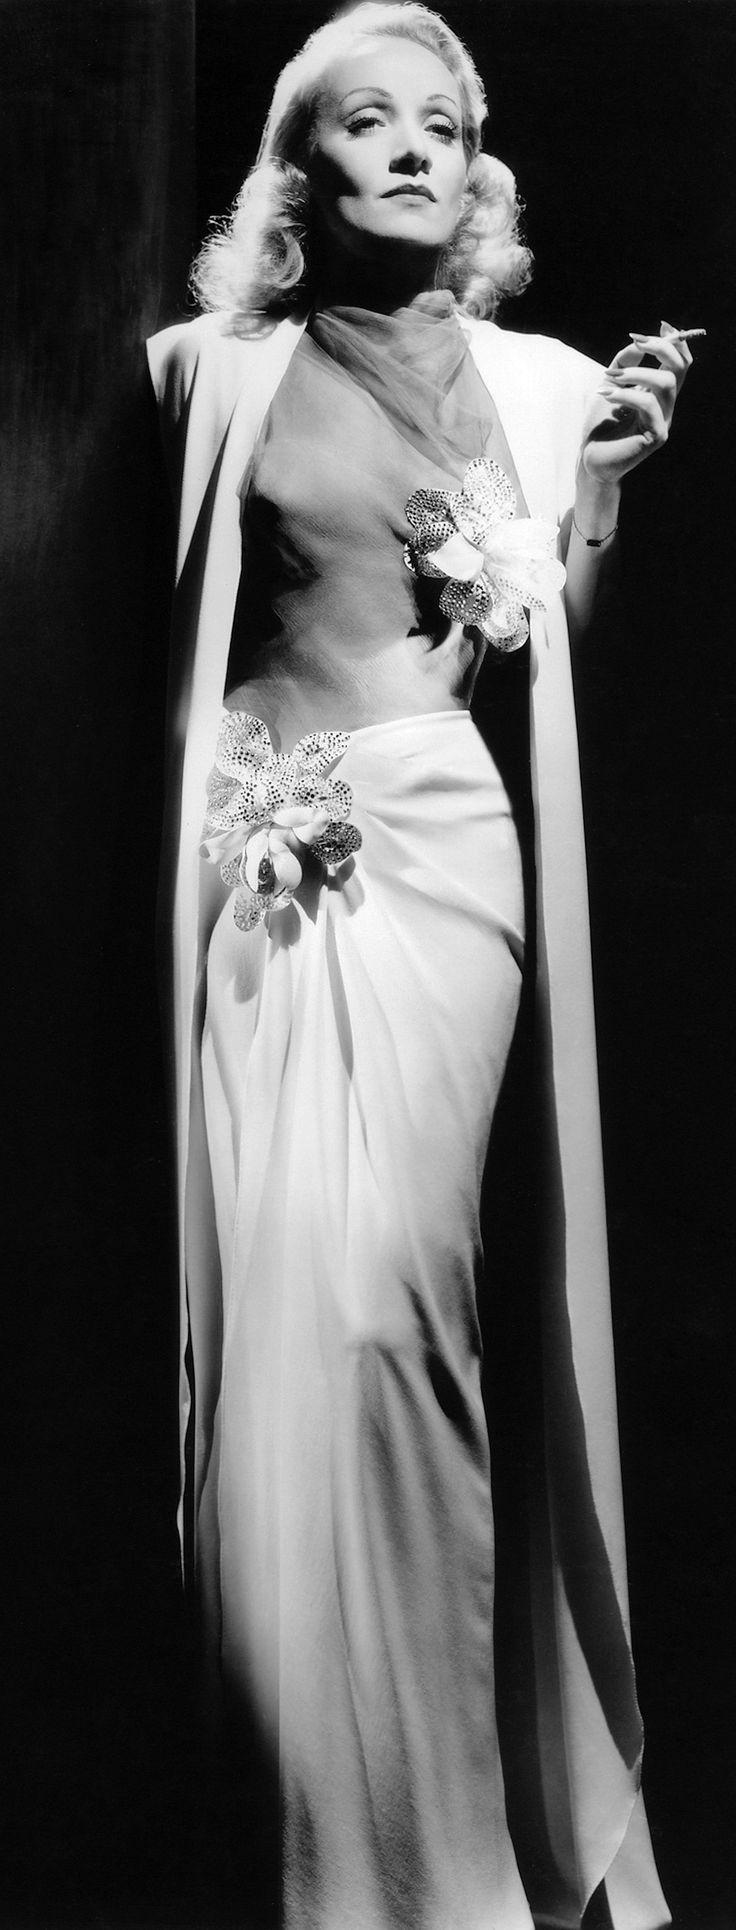 Marlene Dietrich, in Irene Lentz, 1941, Herzen in Flammen. Photo by Scotty Welbourne